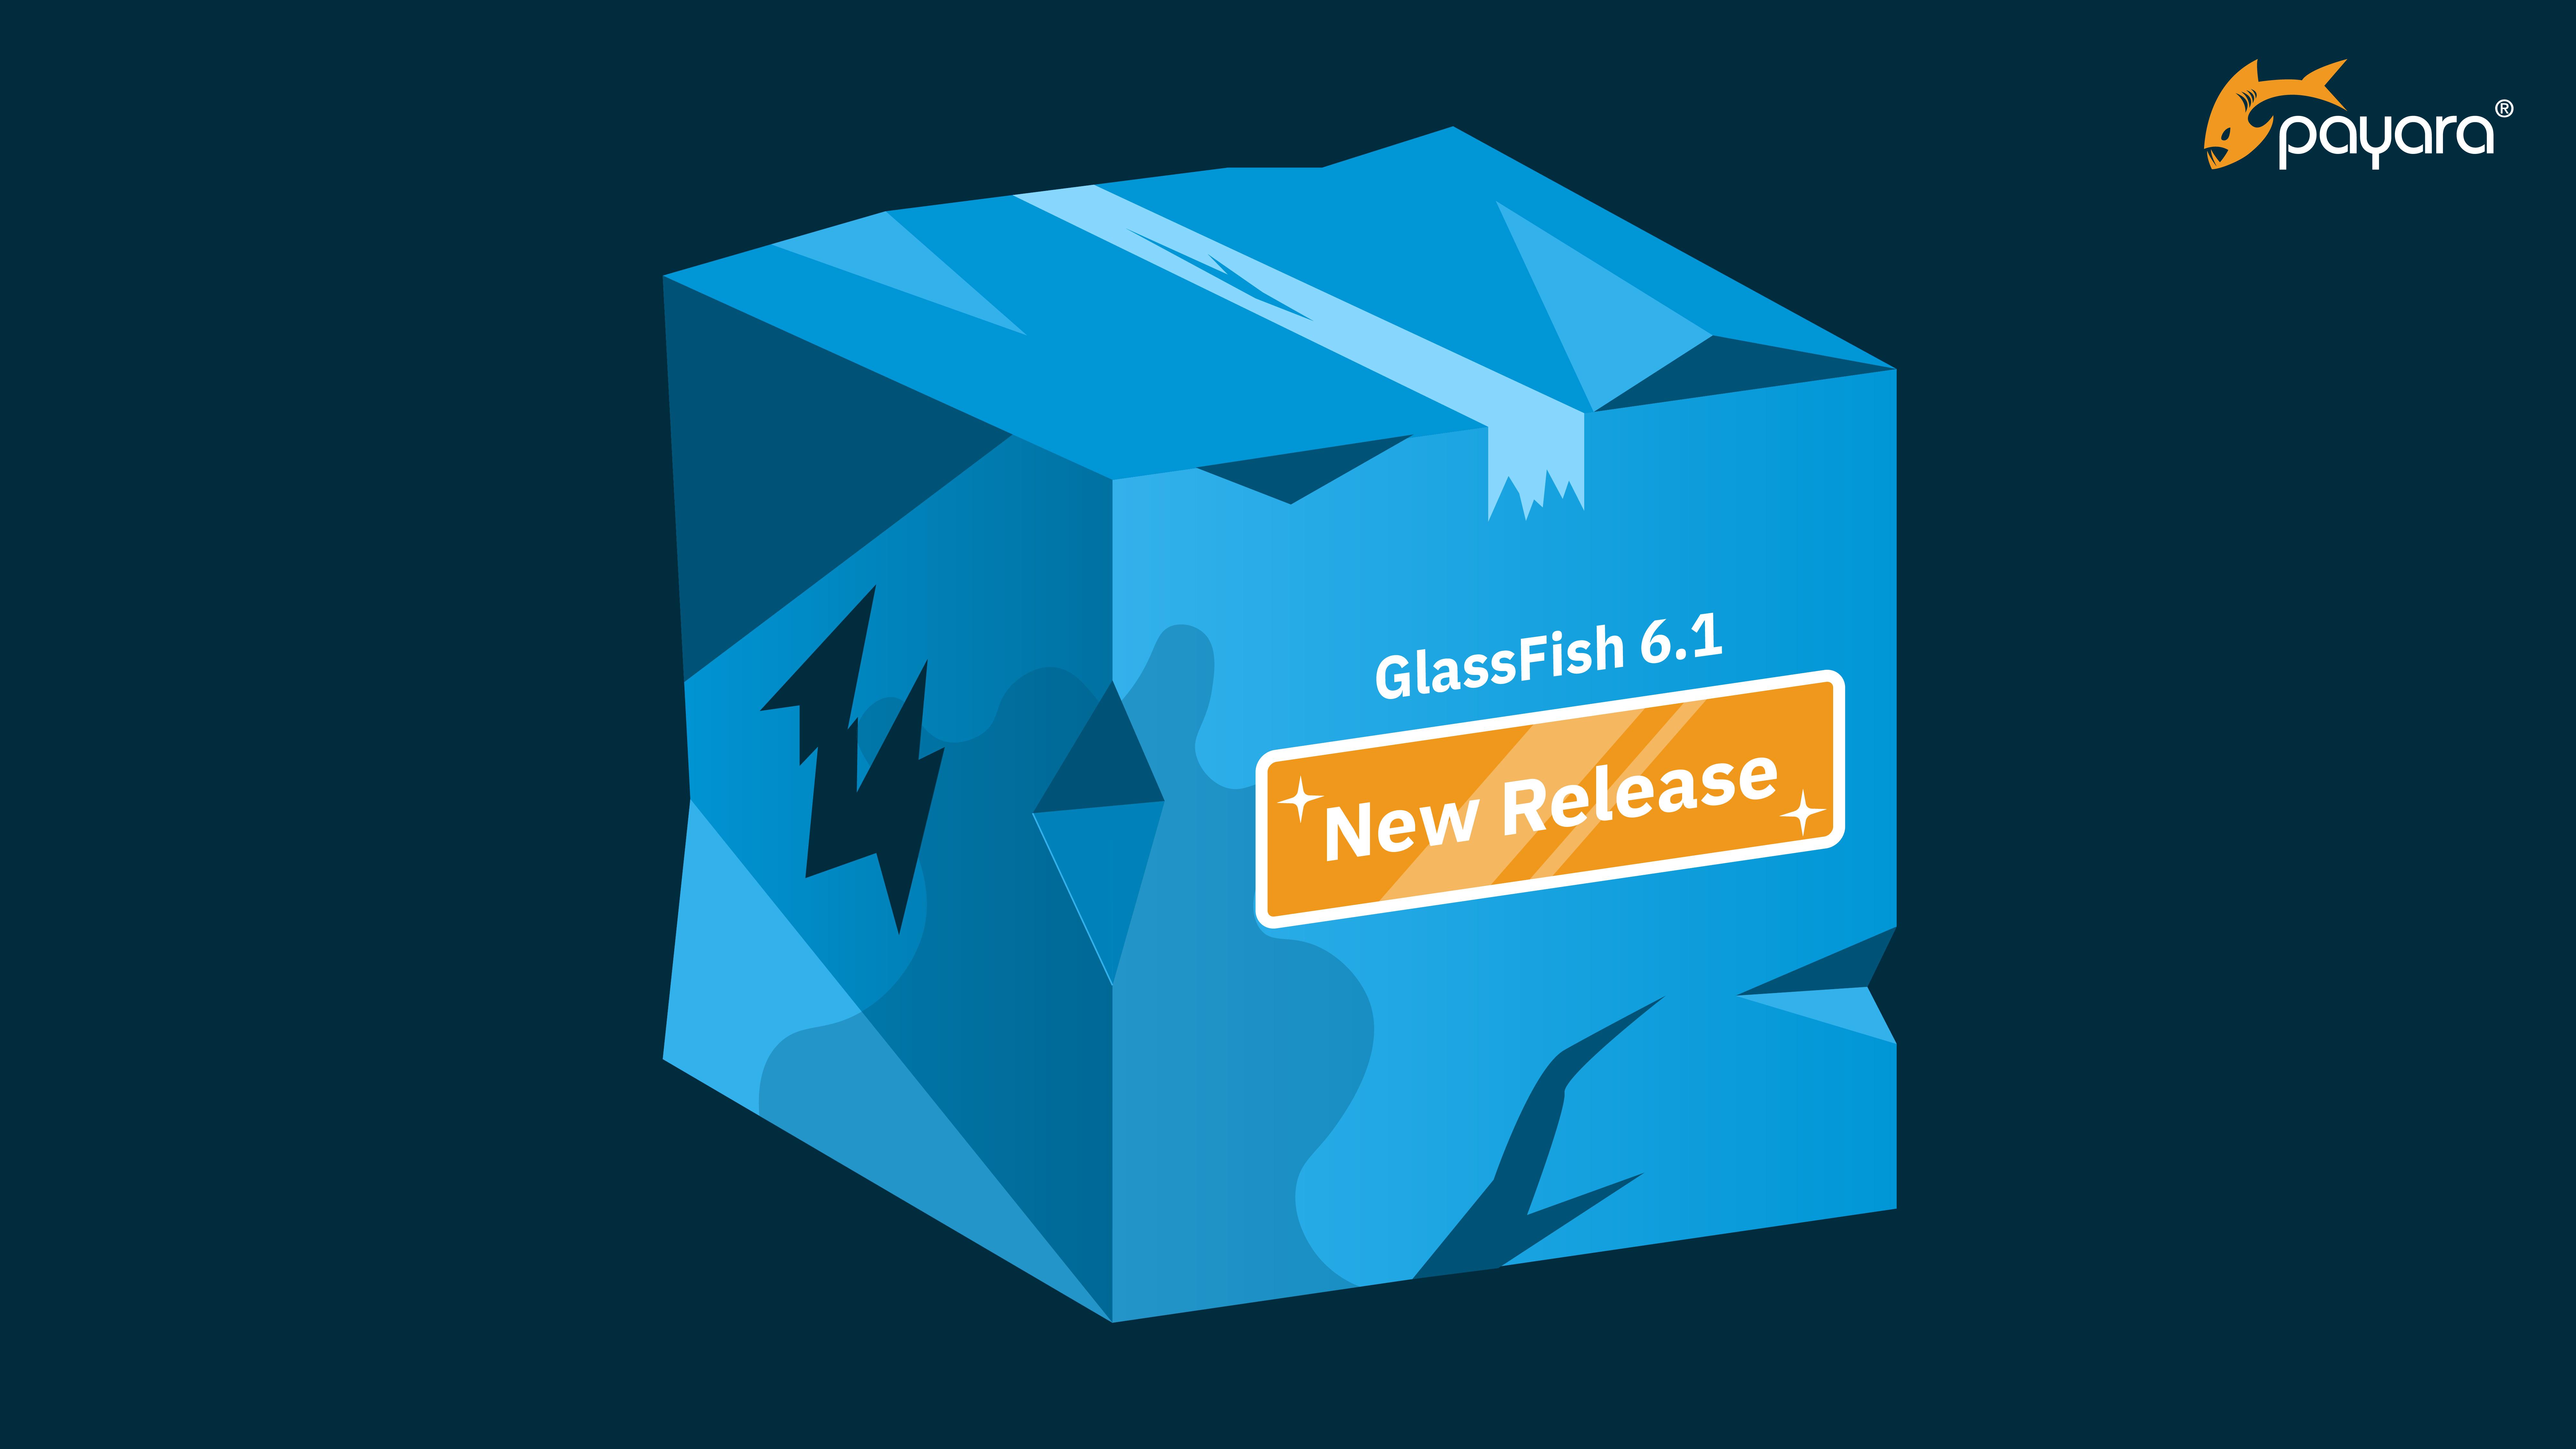 GlassFish 6.1